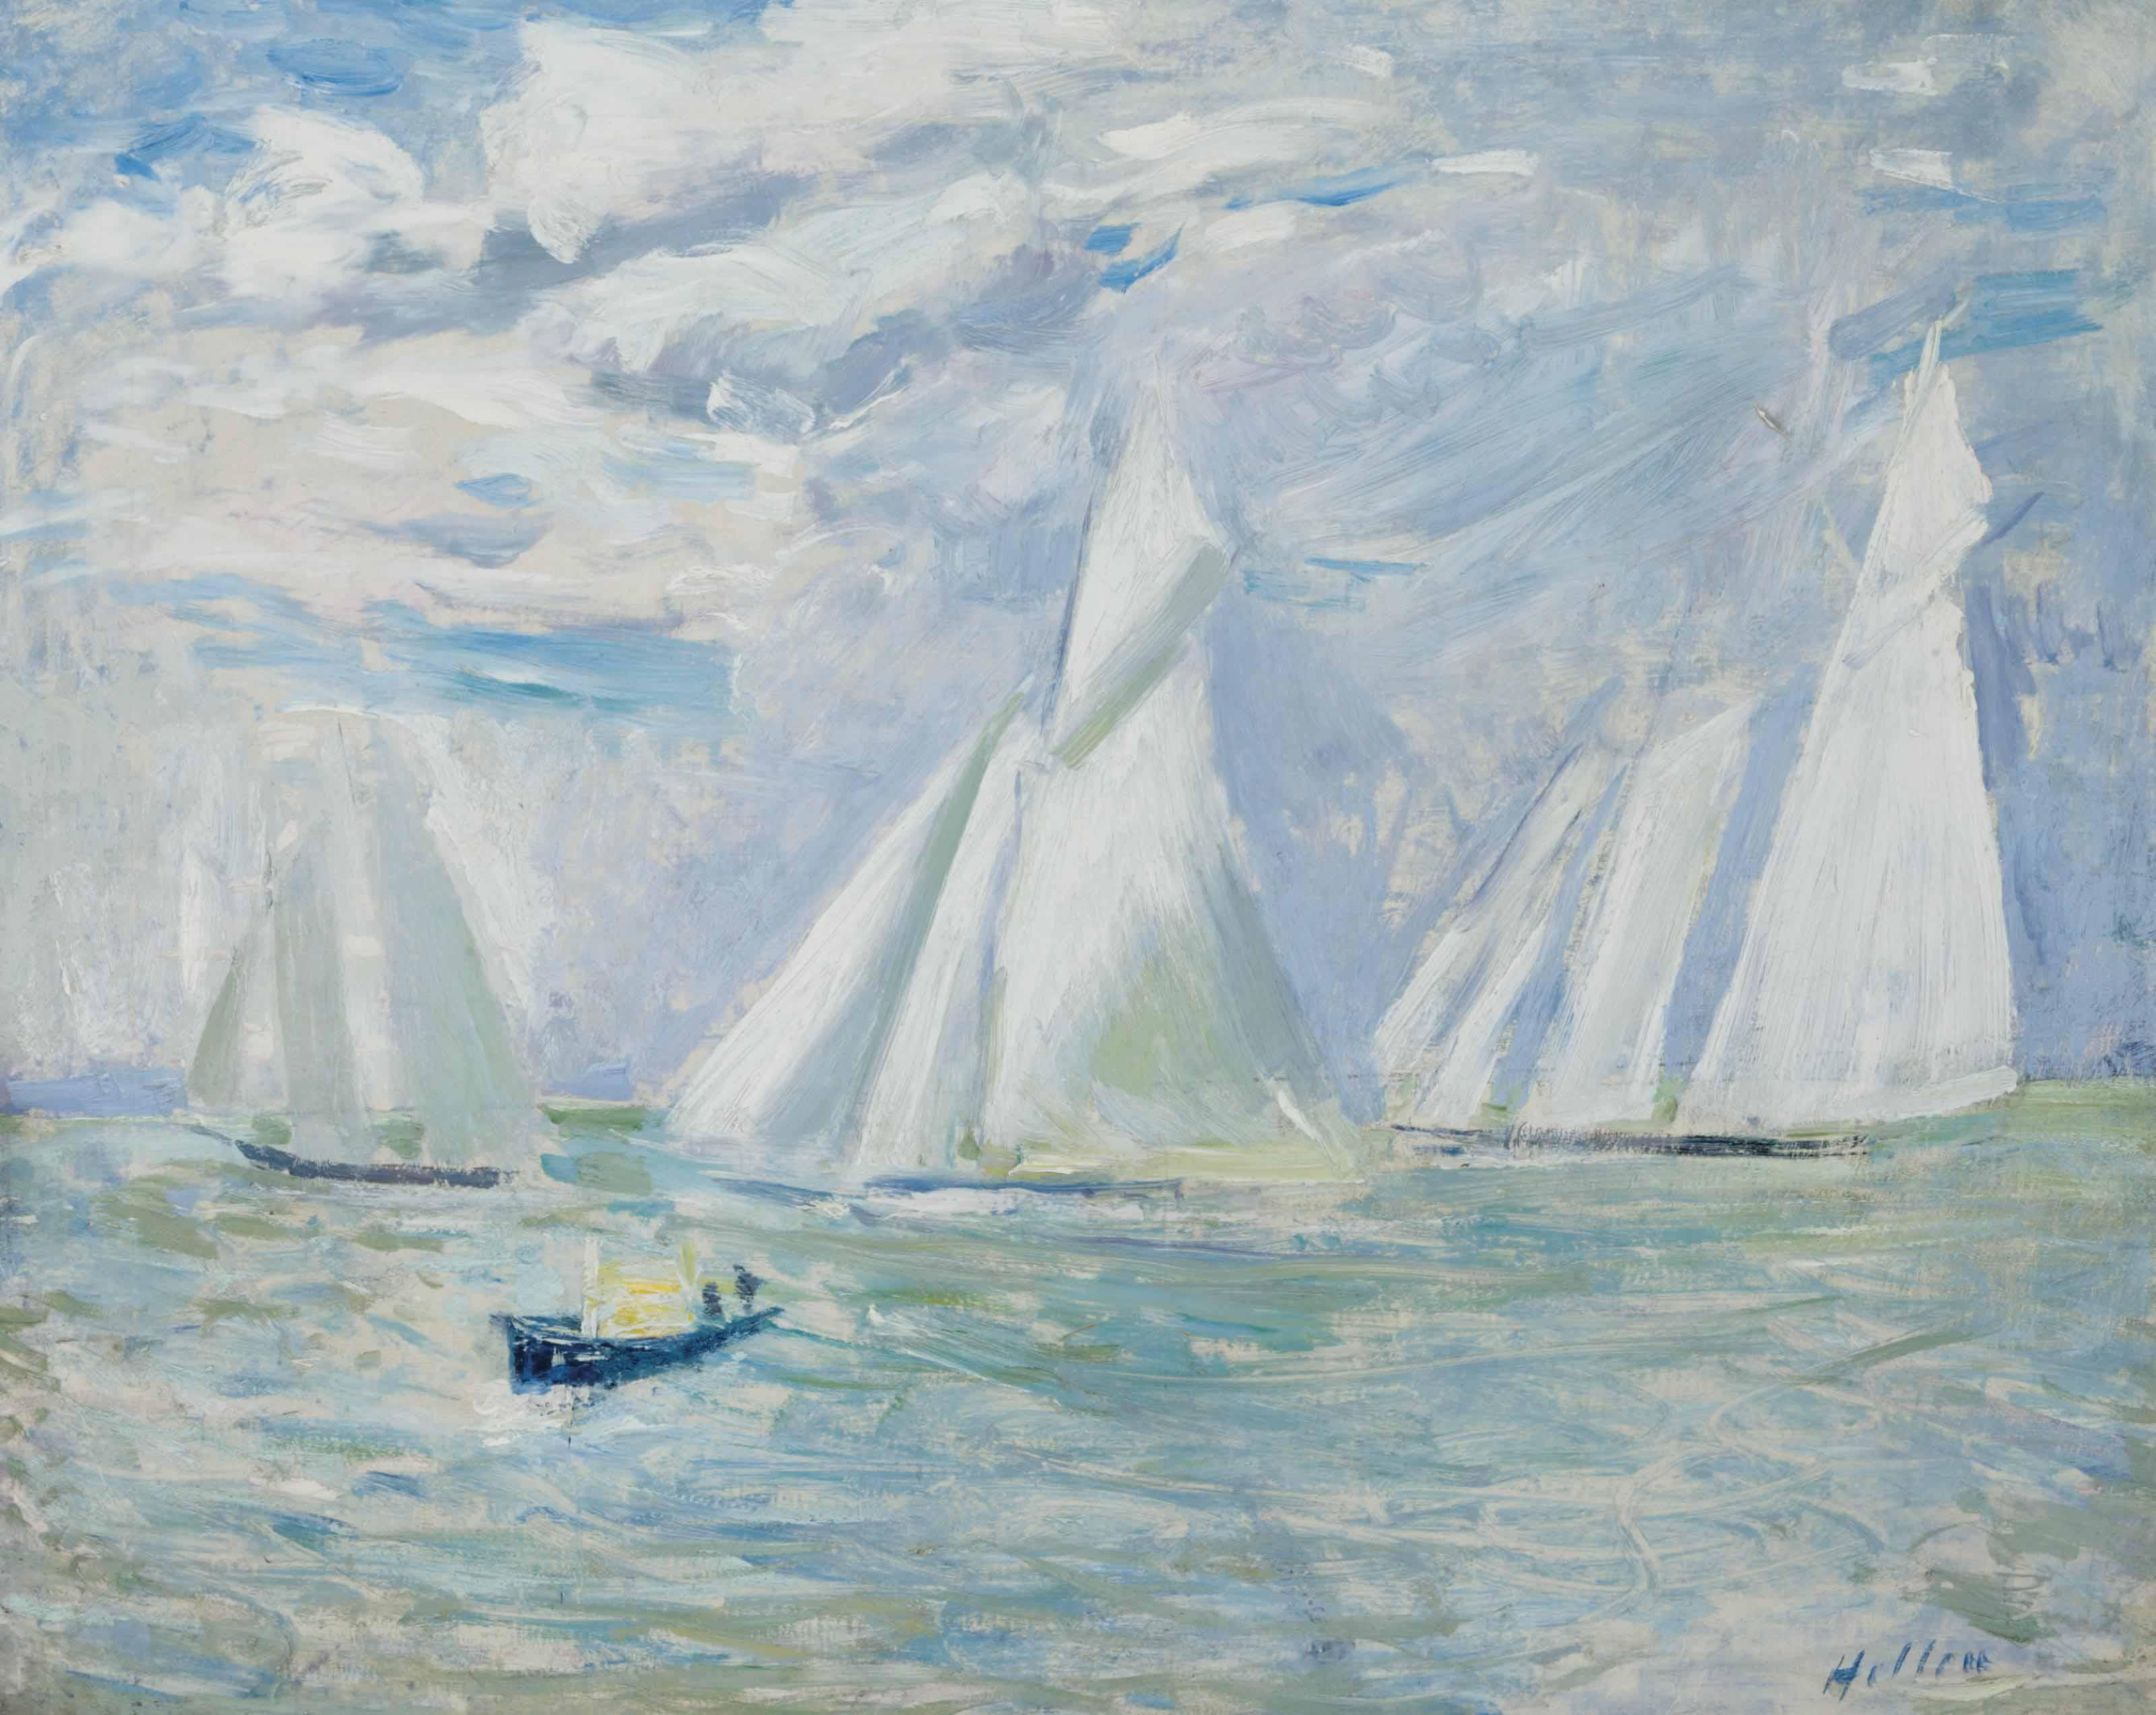 Paul César Helleu (French, 185